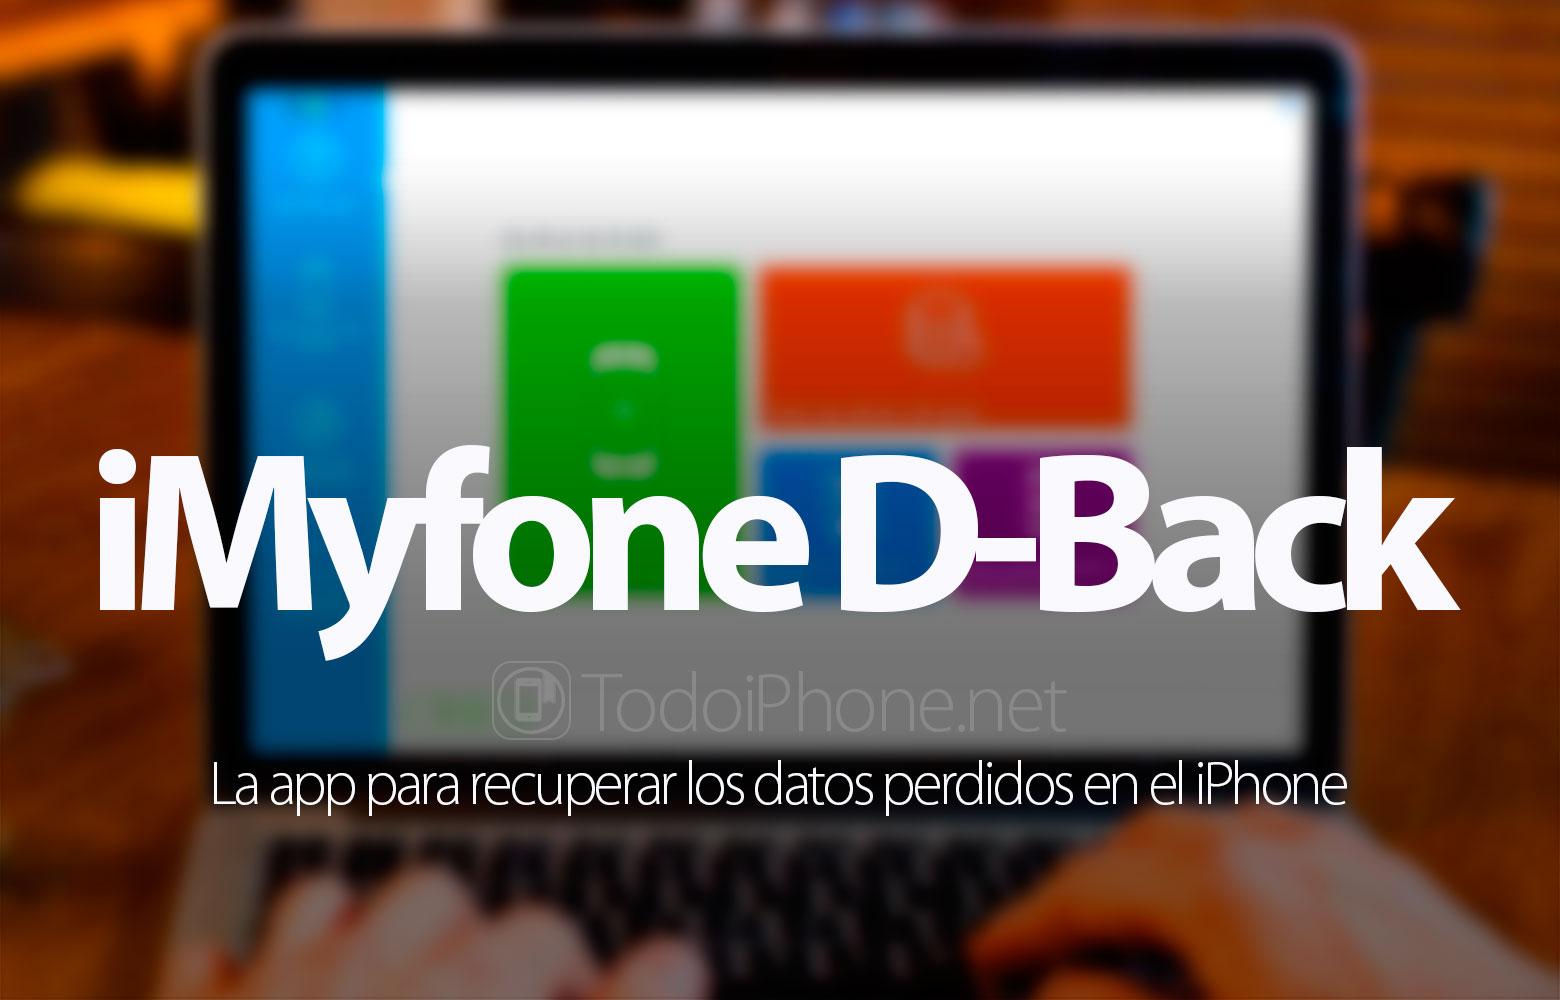 recuperar-datos-perdidos-iphone-prueba-imyfone-d-back